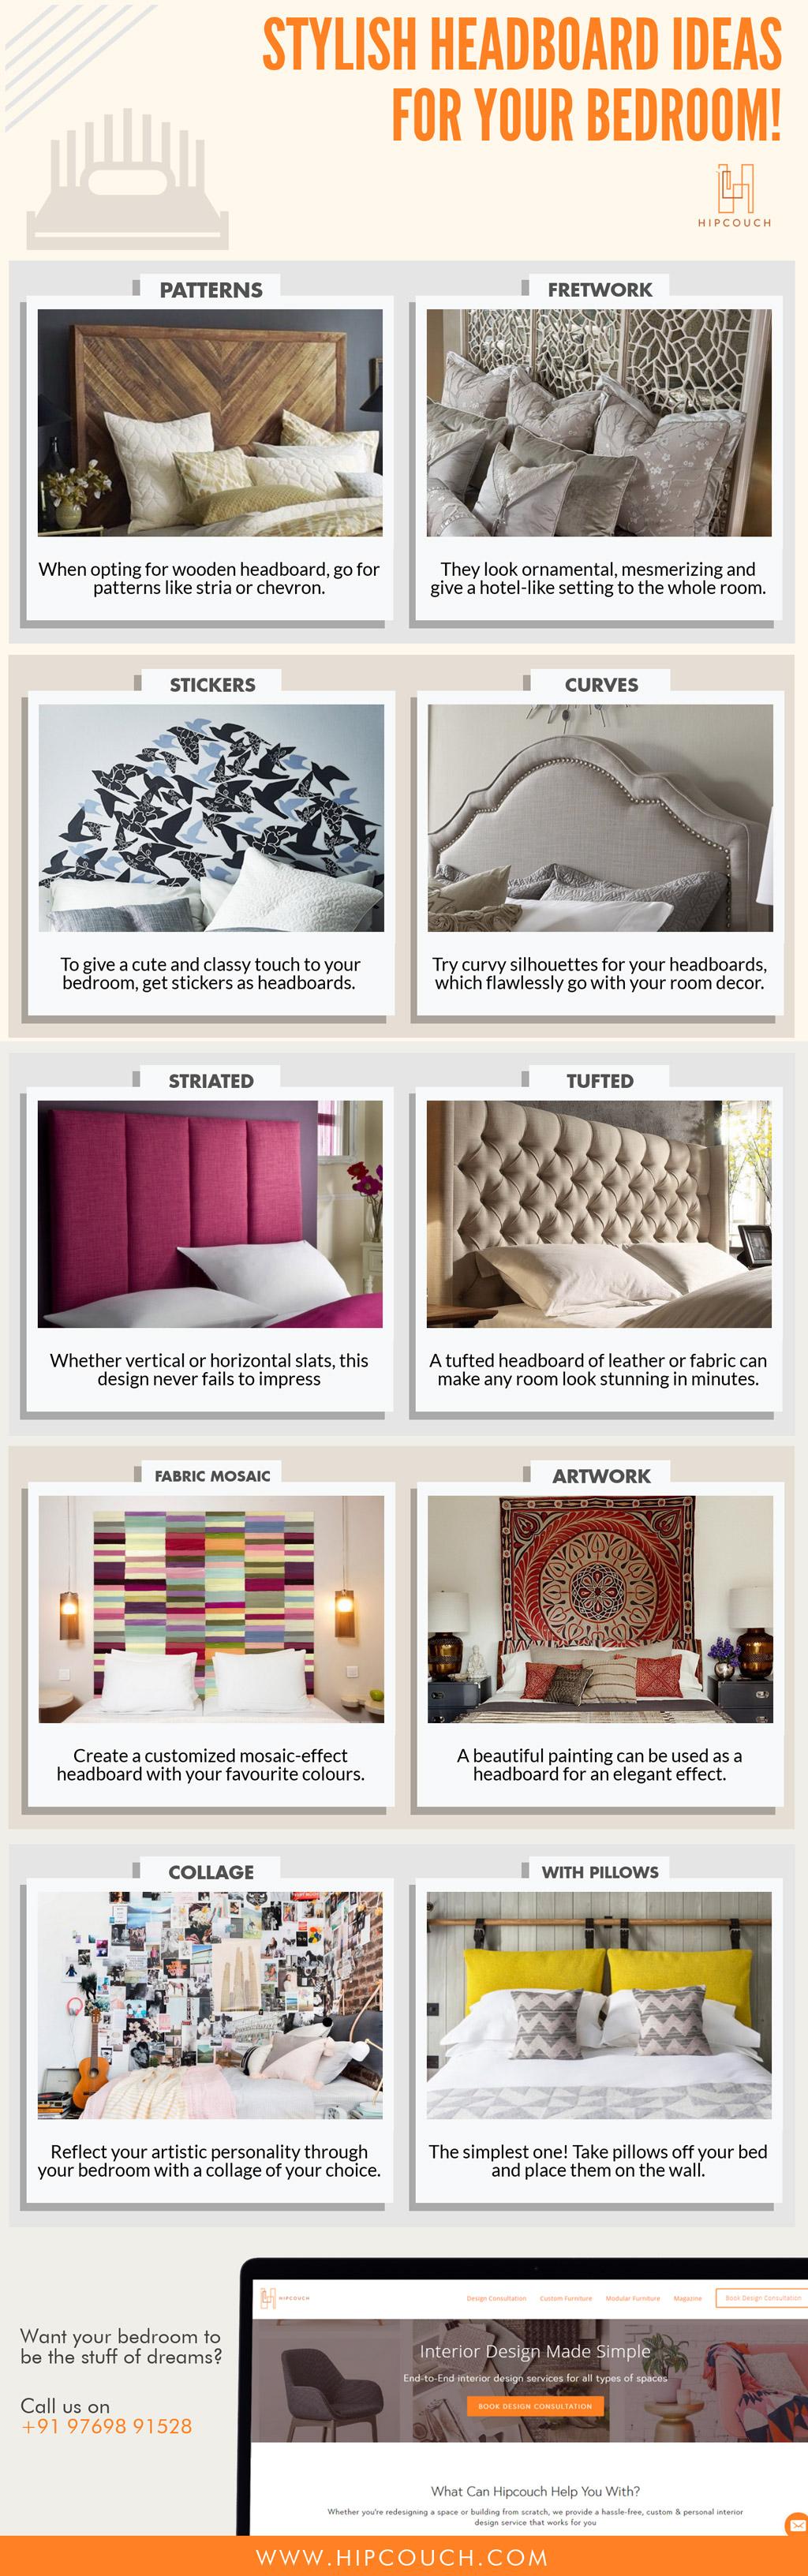 Stylish Headboard Ideas For Your Bedroom!